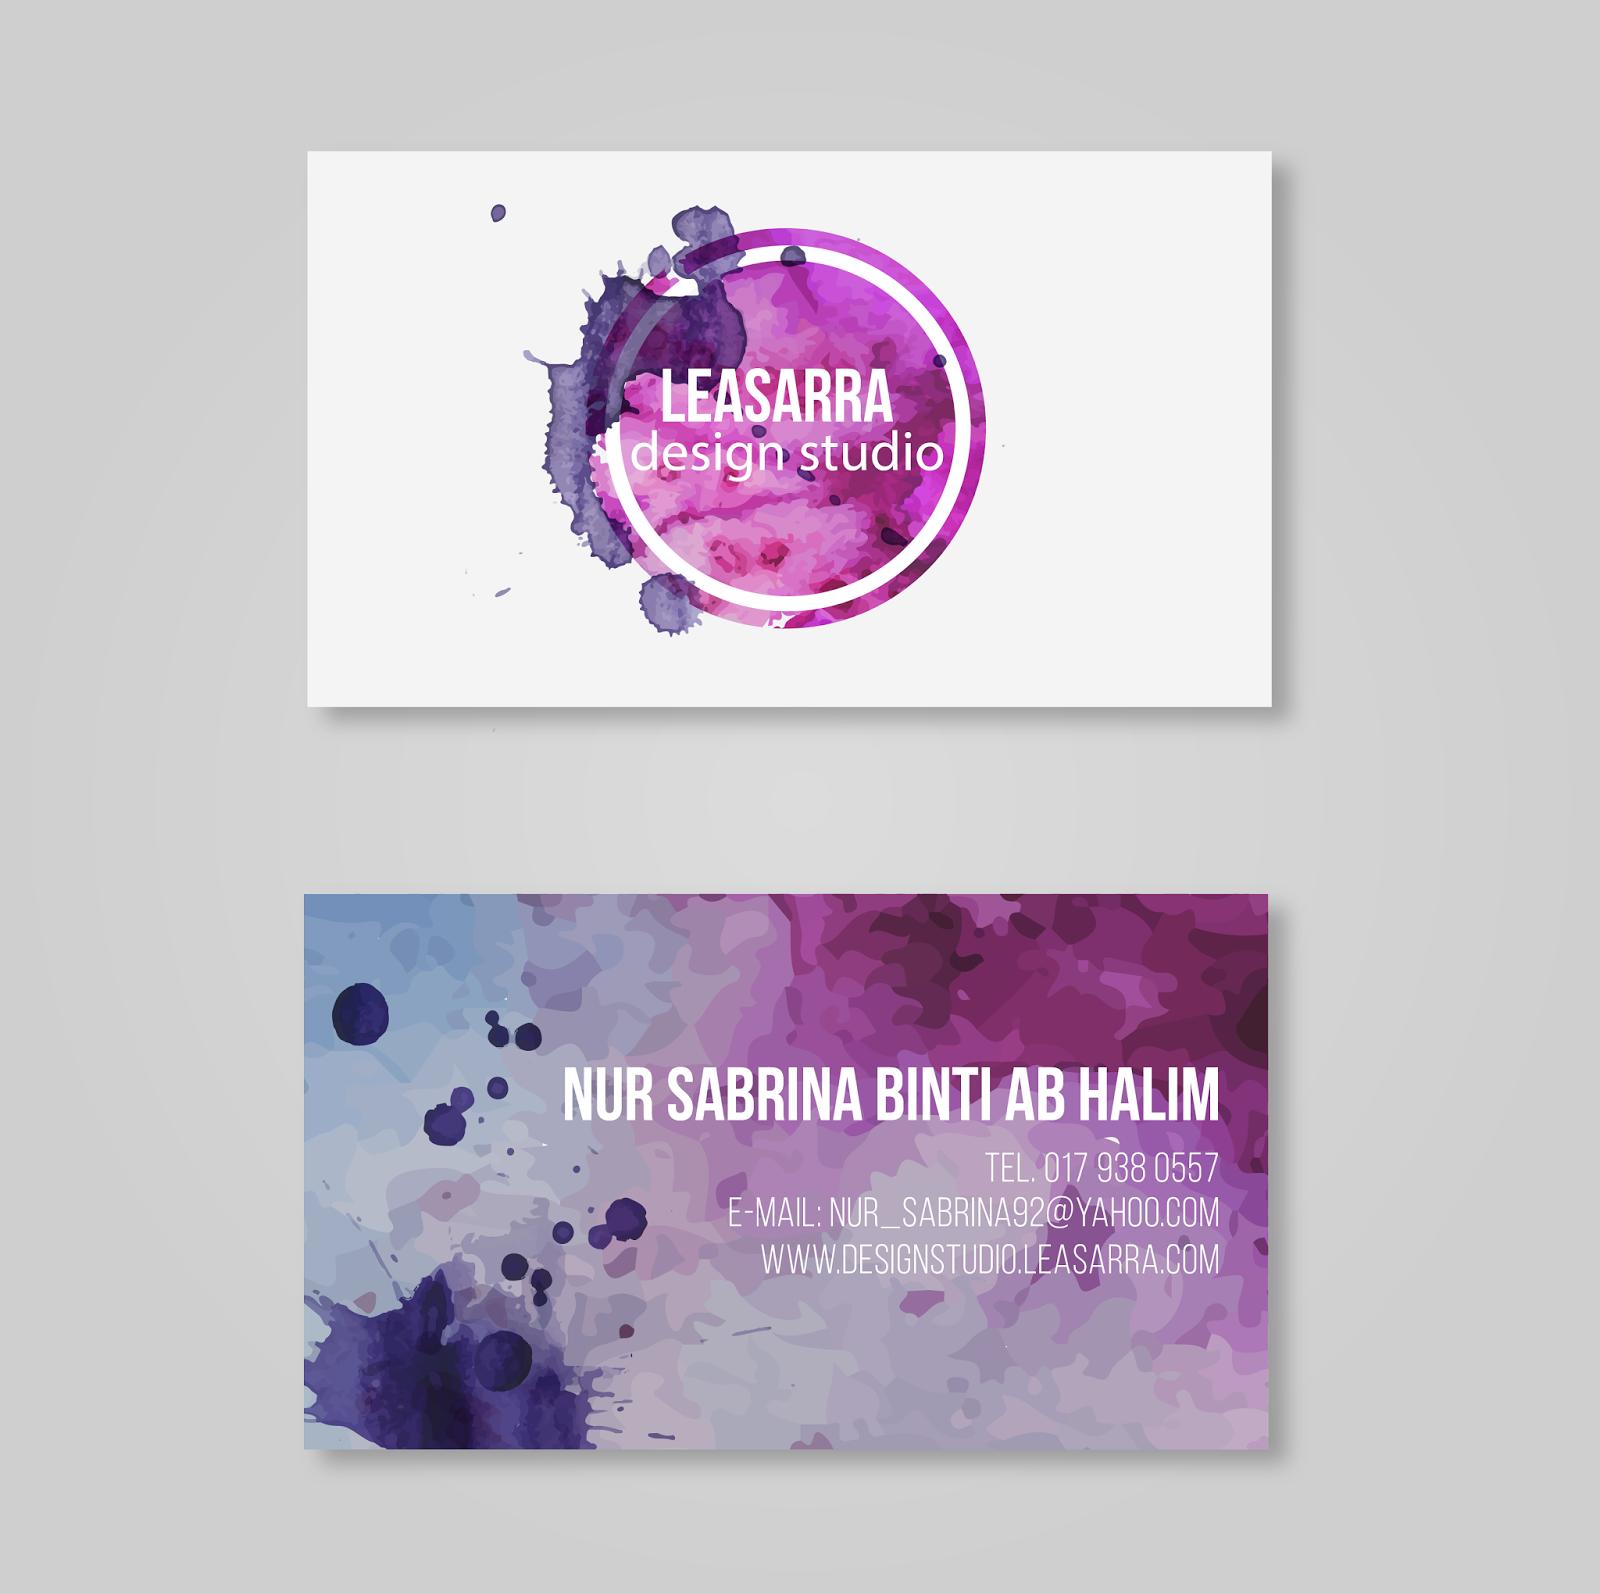 DESIGN BUSINESS CARD MALAYSIA - PRINTING MURAH - rihahalim